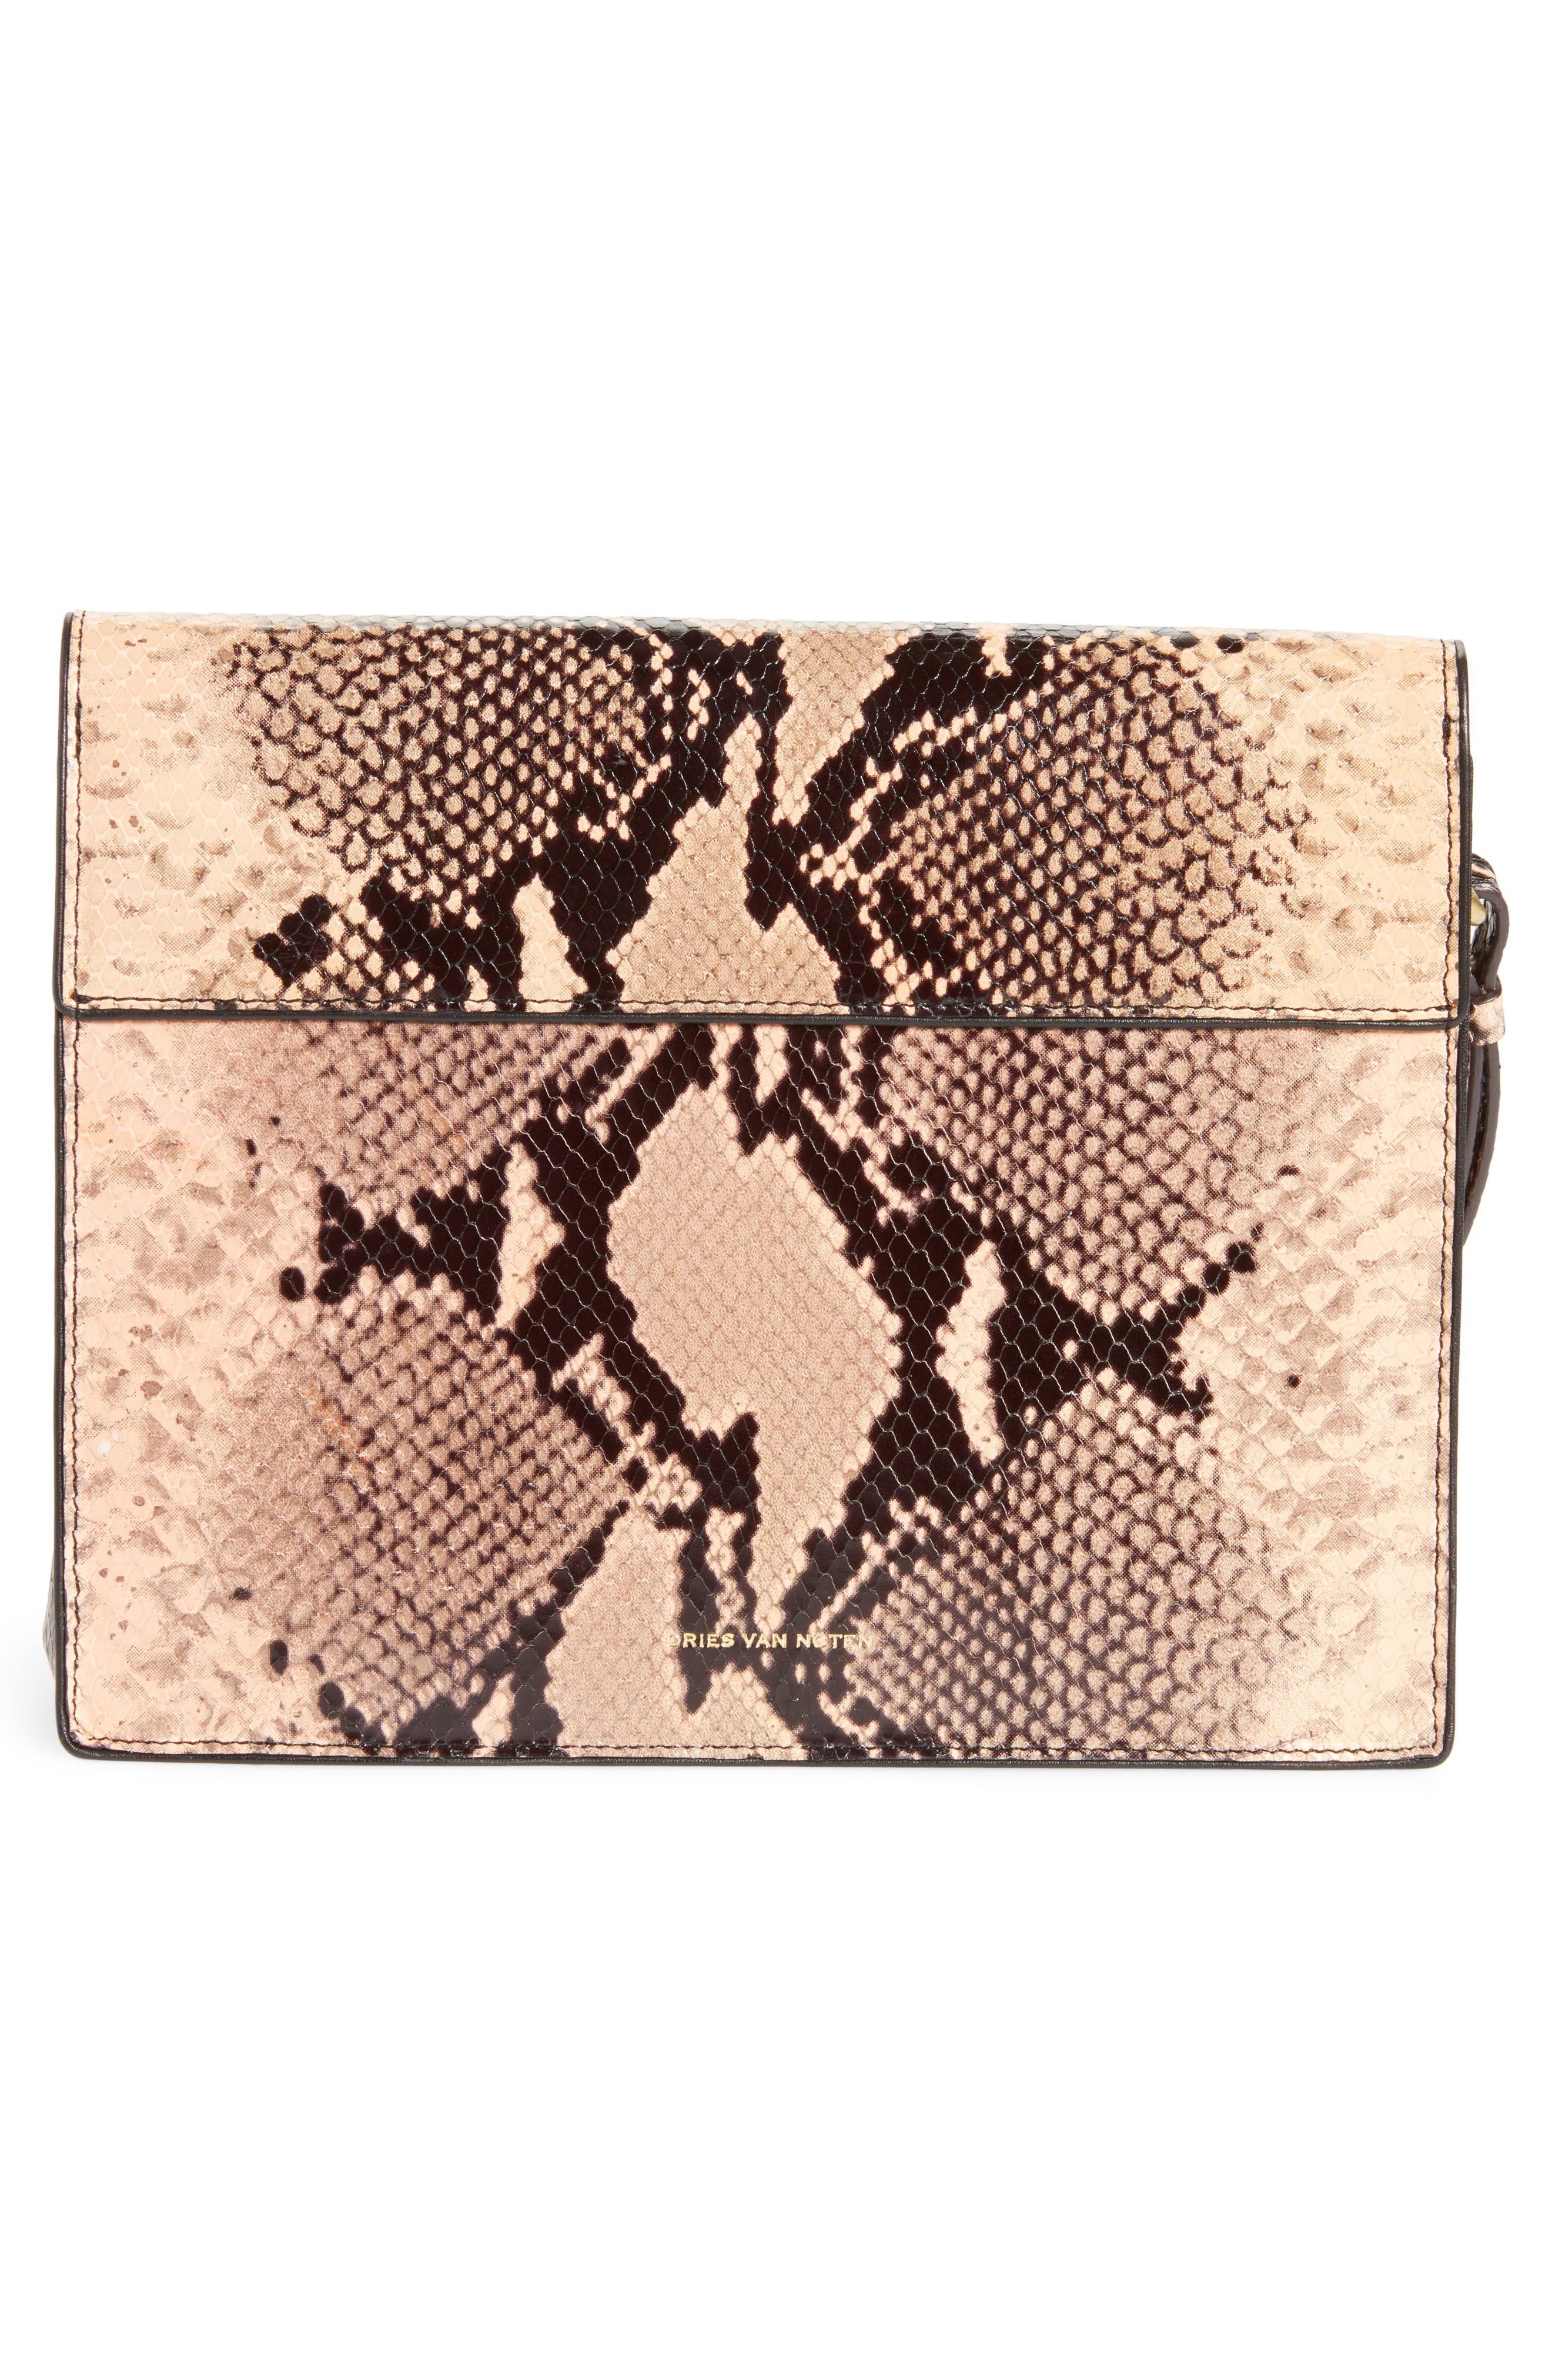 Snake Embossed Leather Wristlet Clutch,                             Alternate thumbnail 3, color,                             Camel